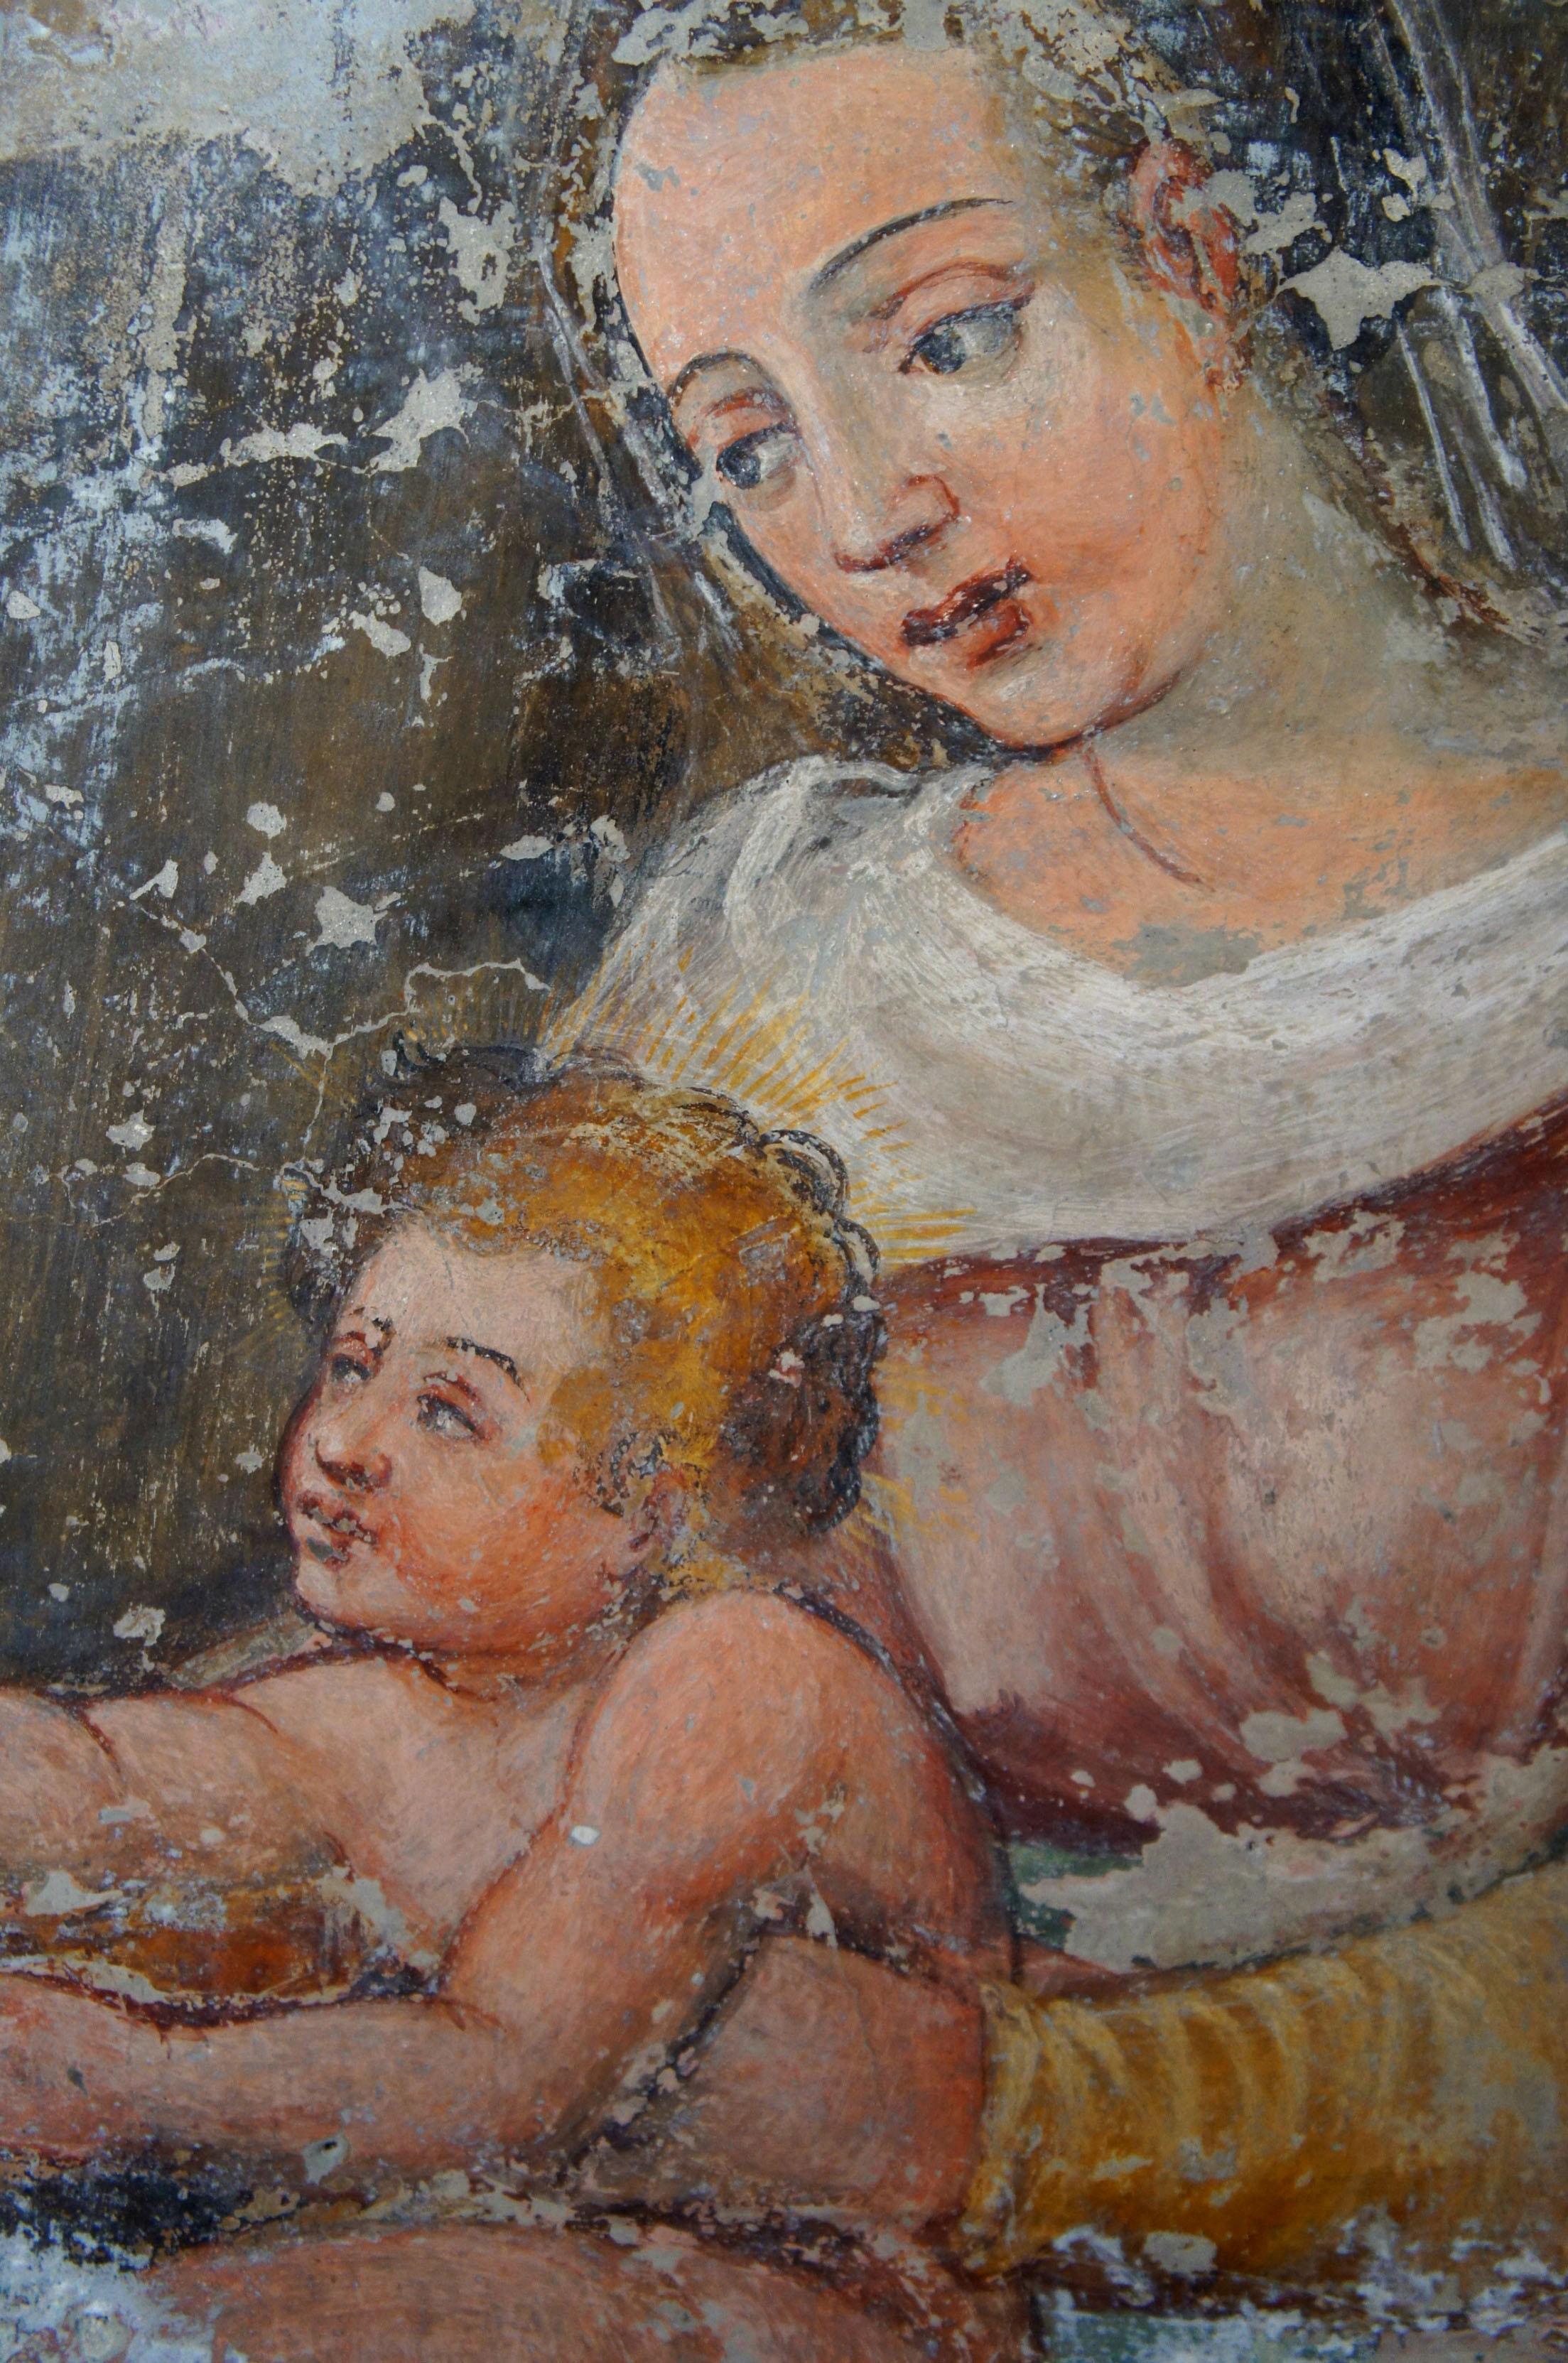 dettaglio affreschi s. caterina